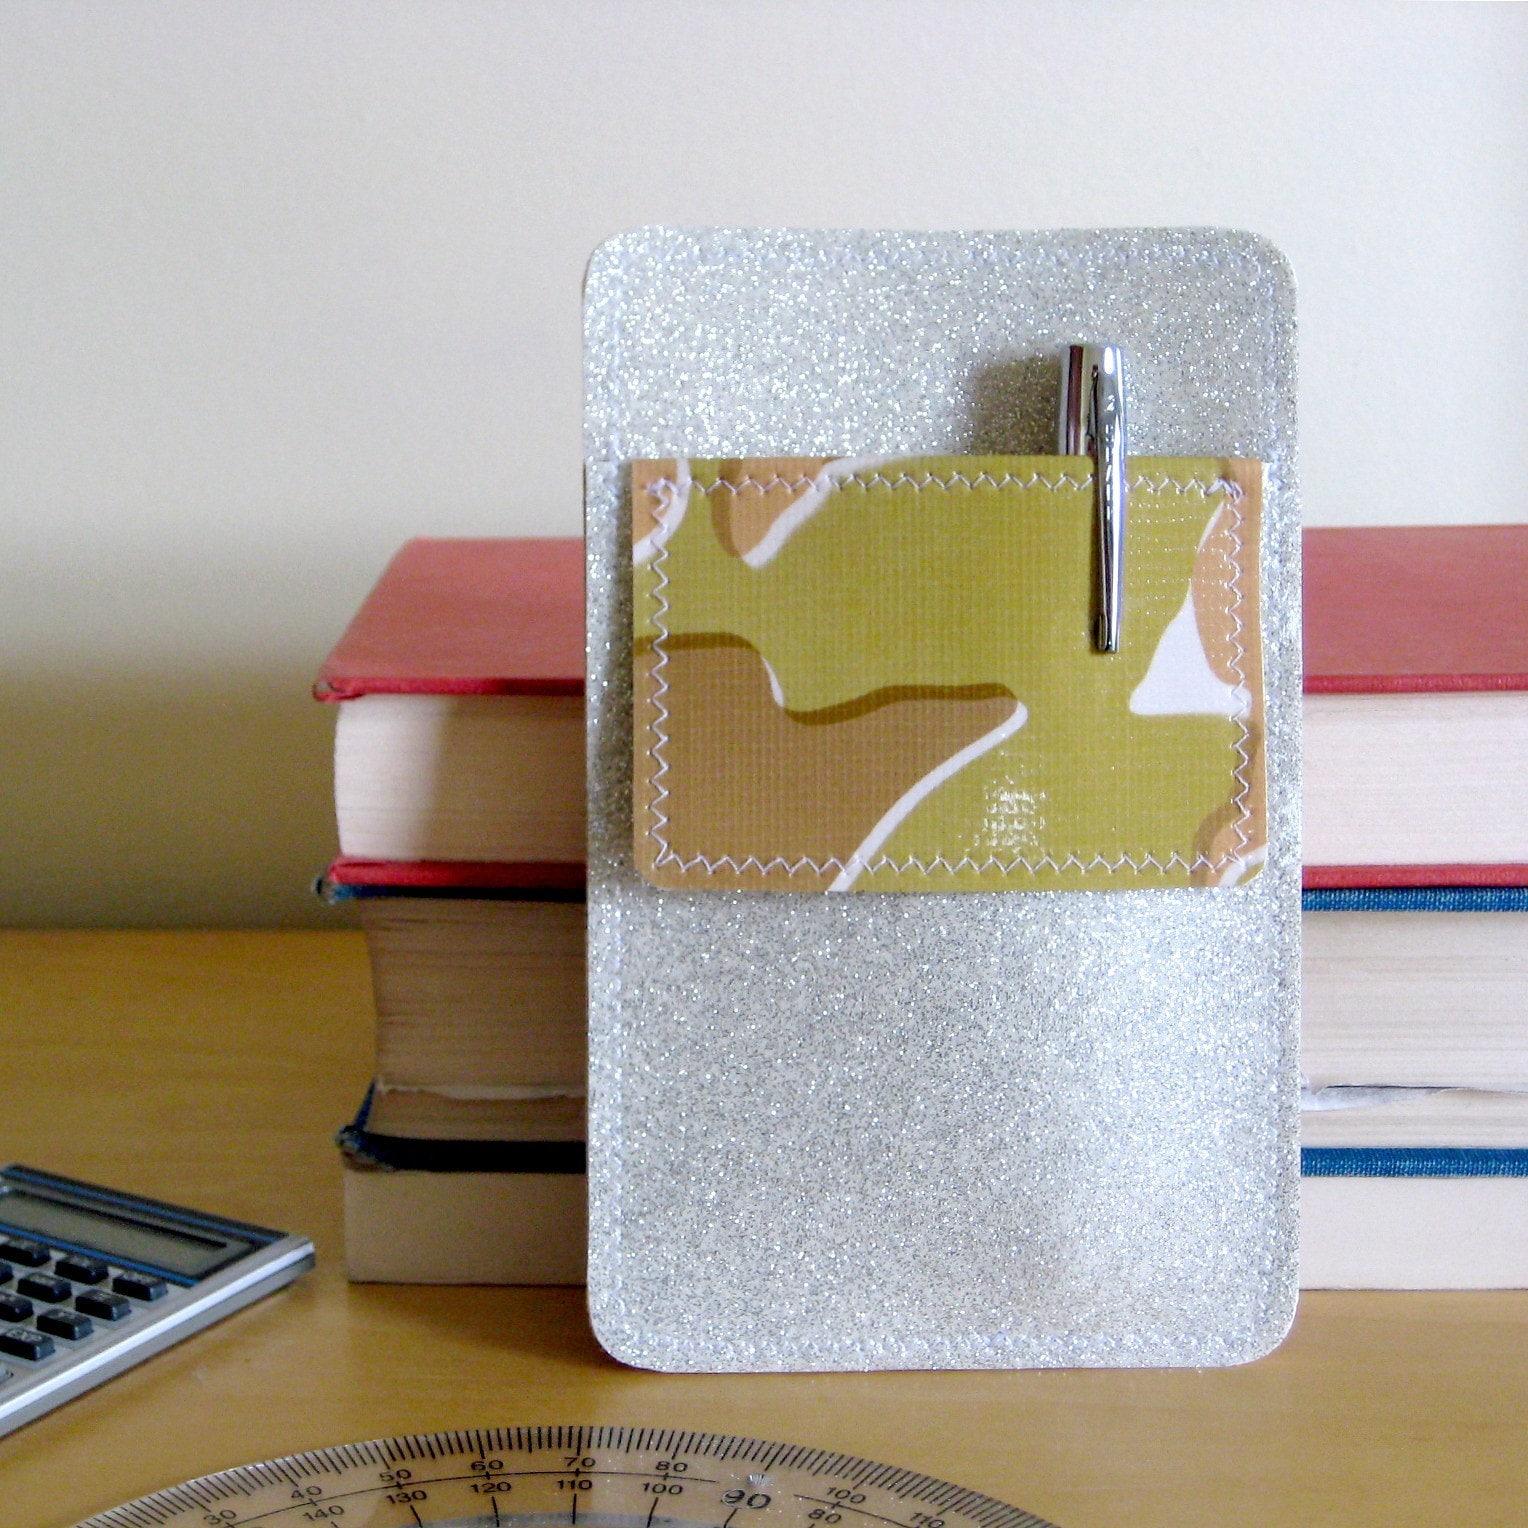 Nerd Power Pocket Protector In White Silver Sparkle Vinyl